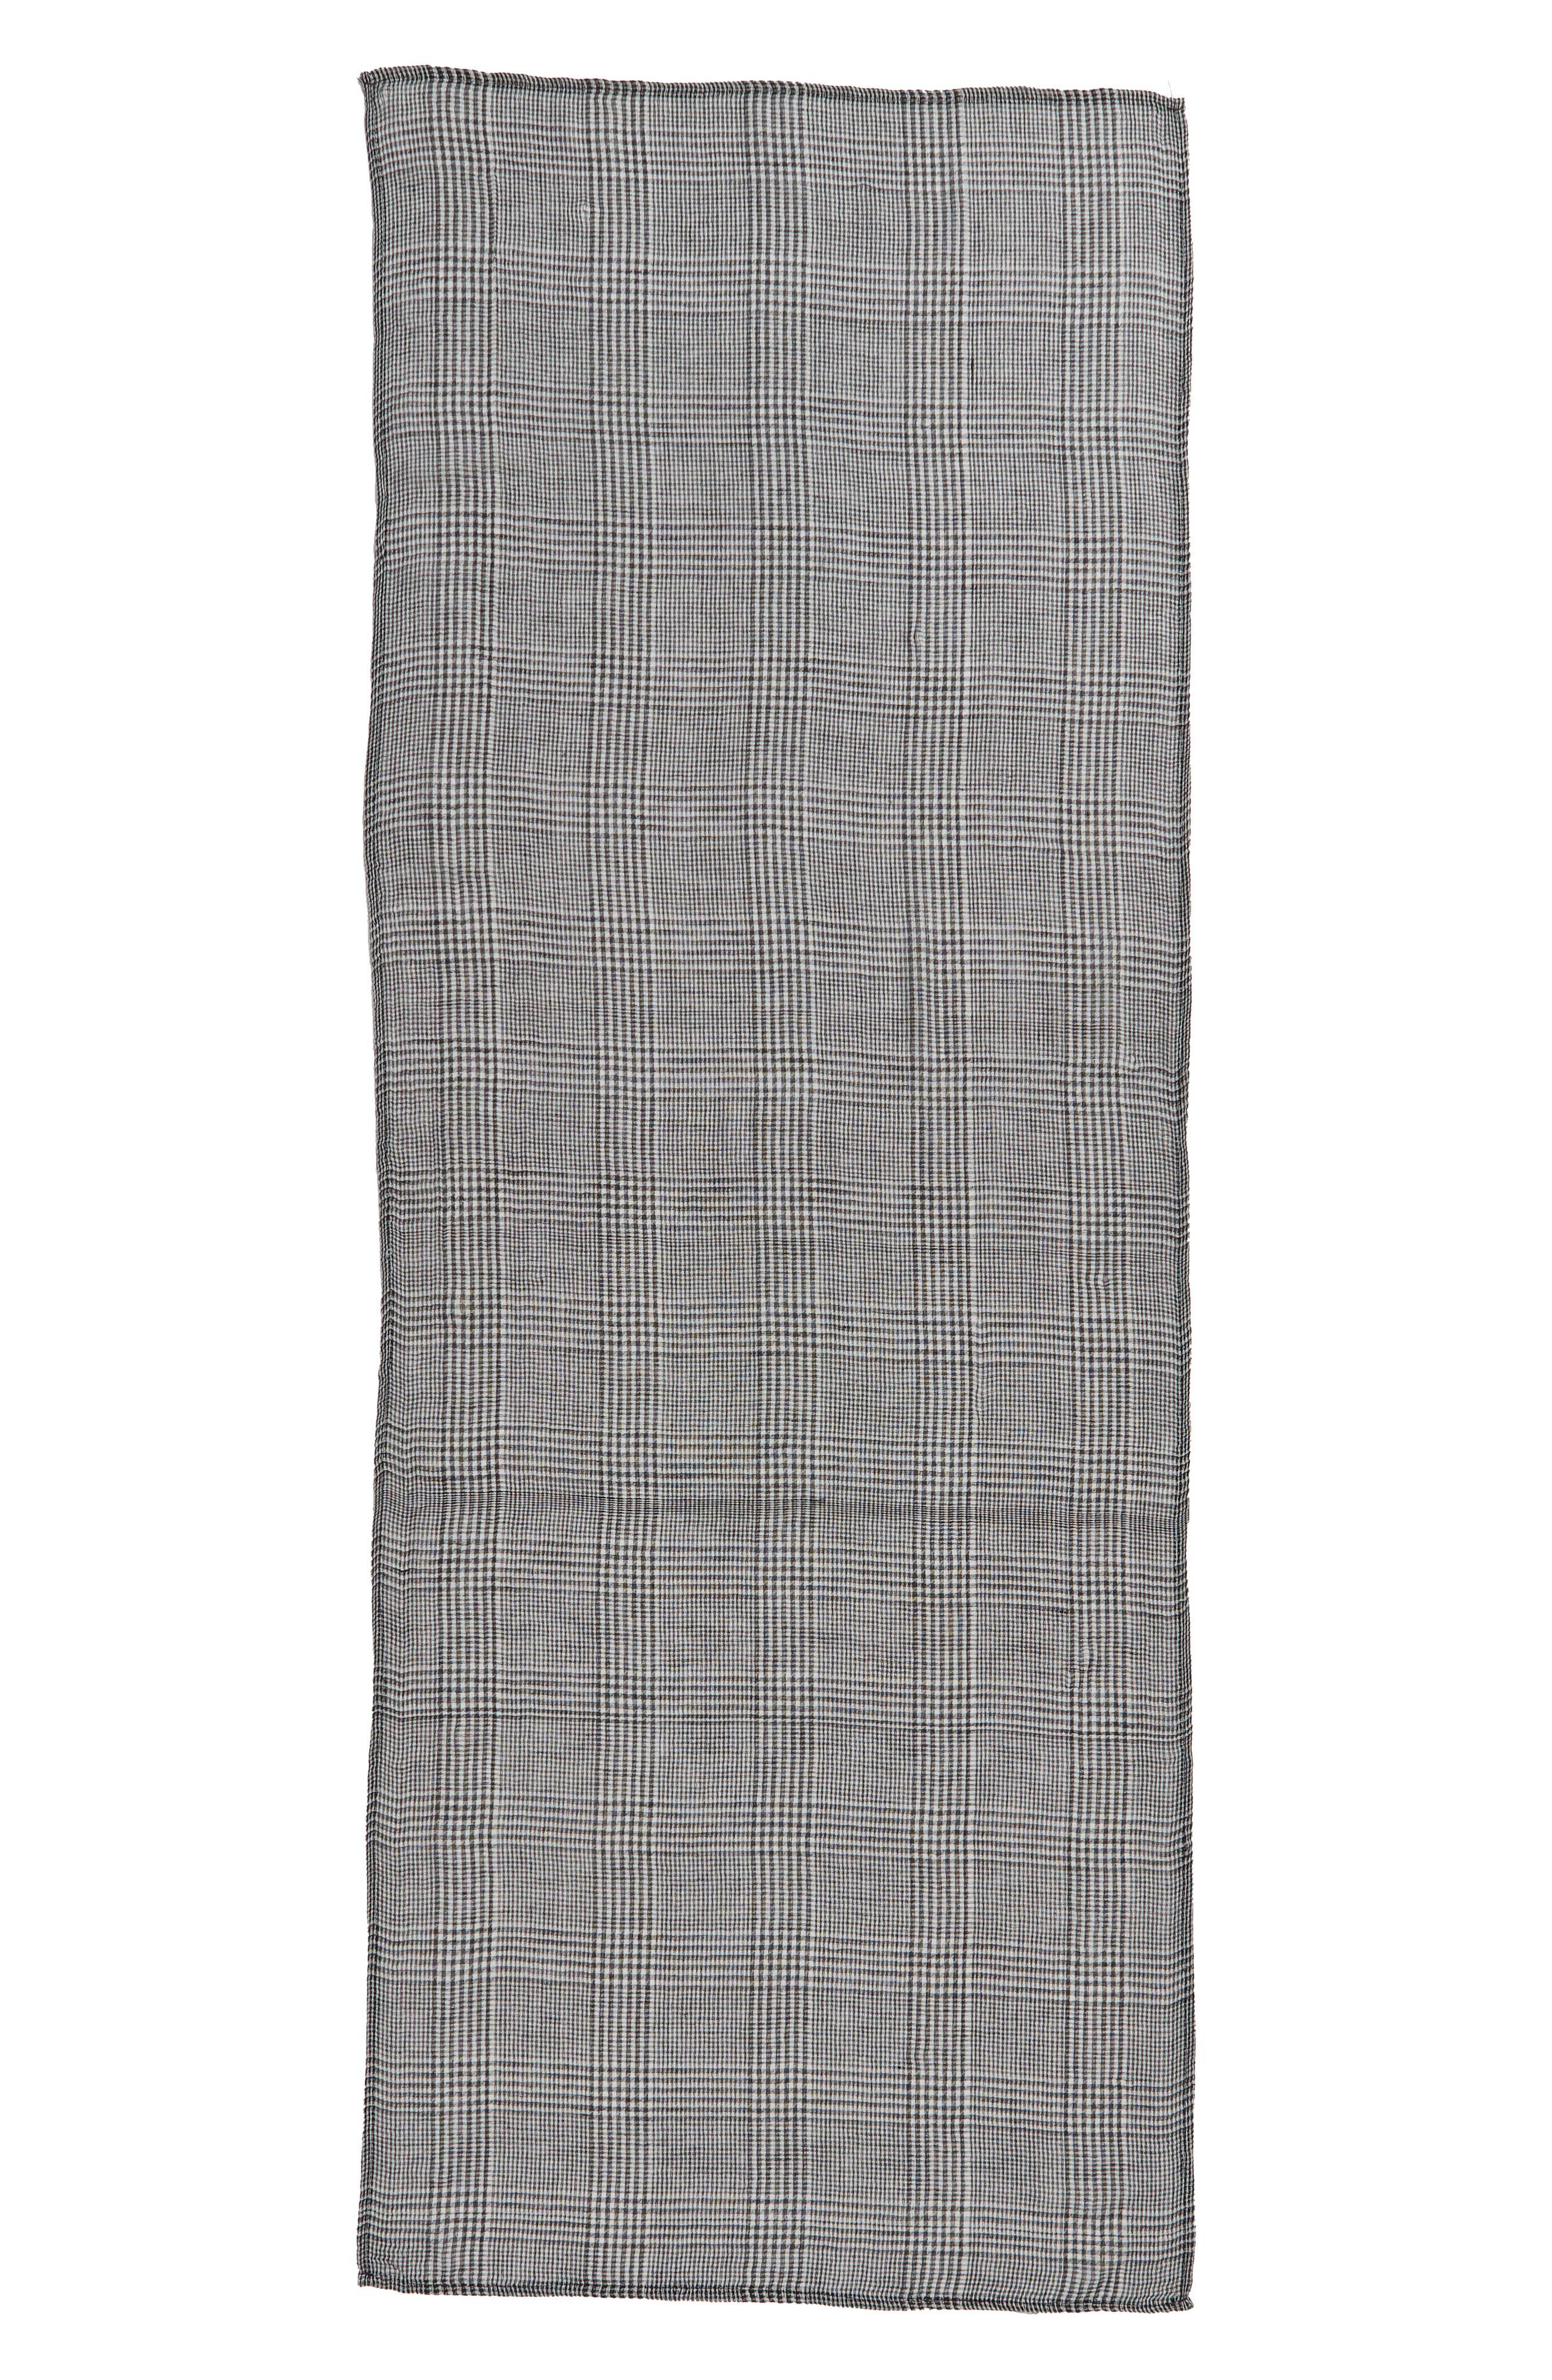 Menswear Plaid Oblong Scarf,                             Alternate thumbnail 3, color,                             GREY MULTI